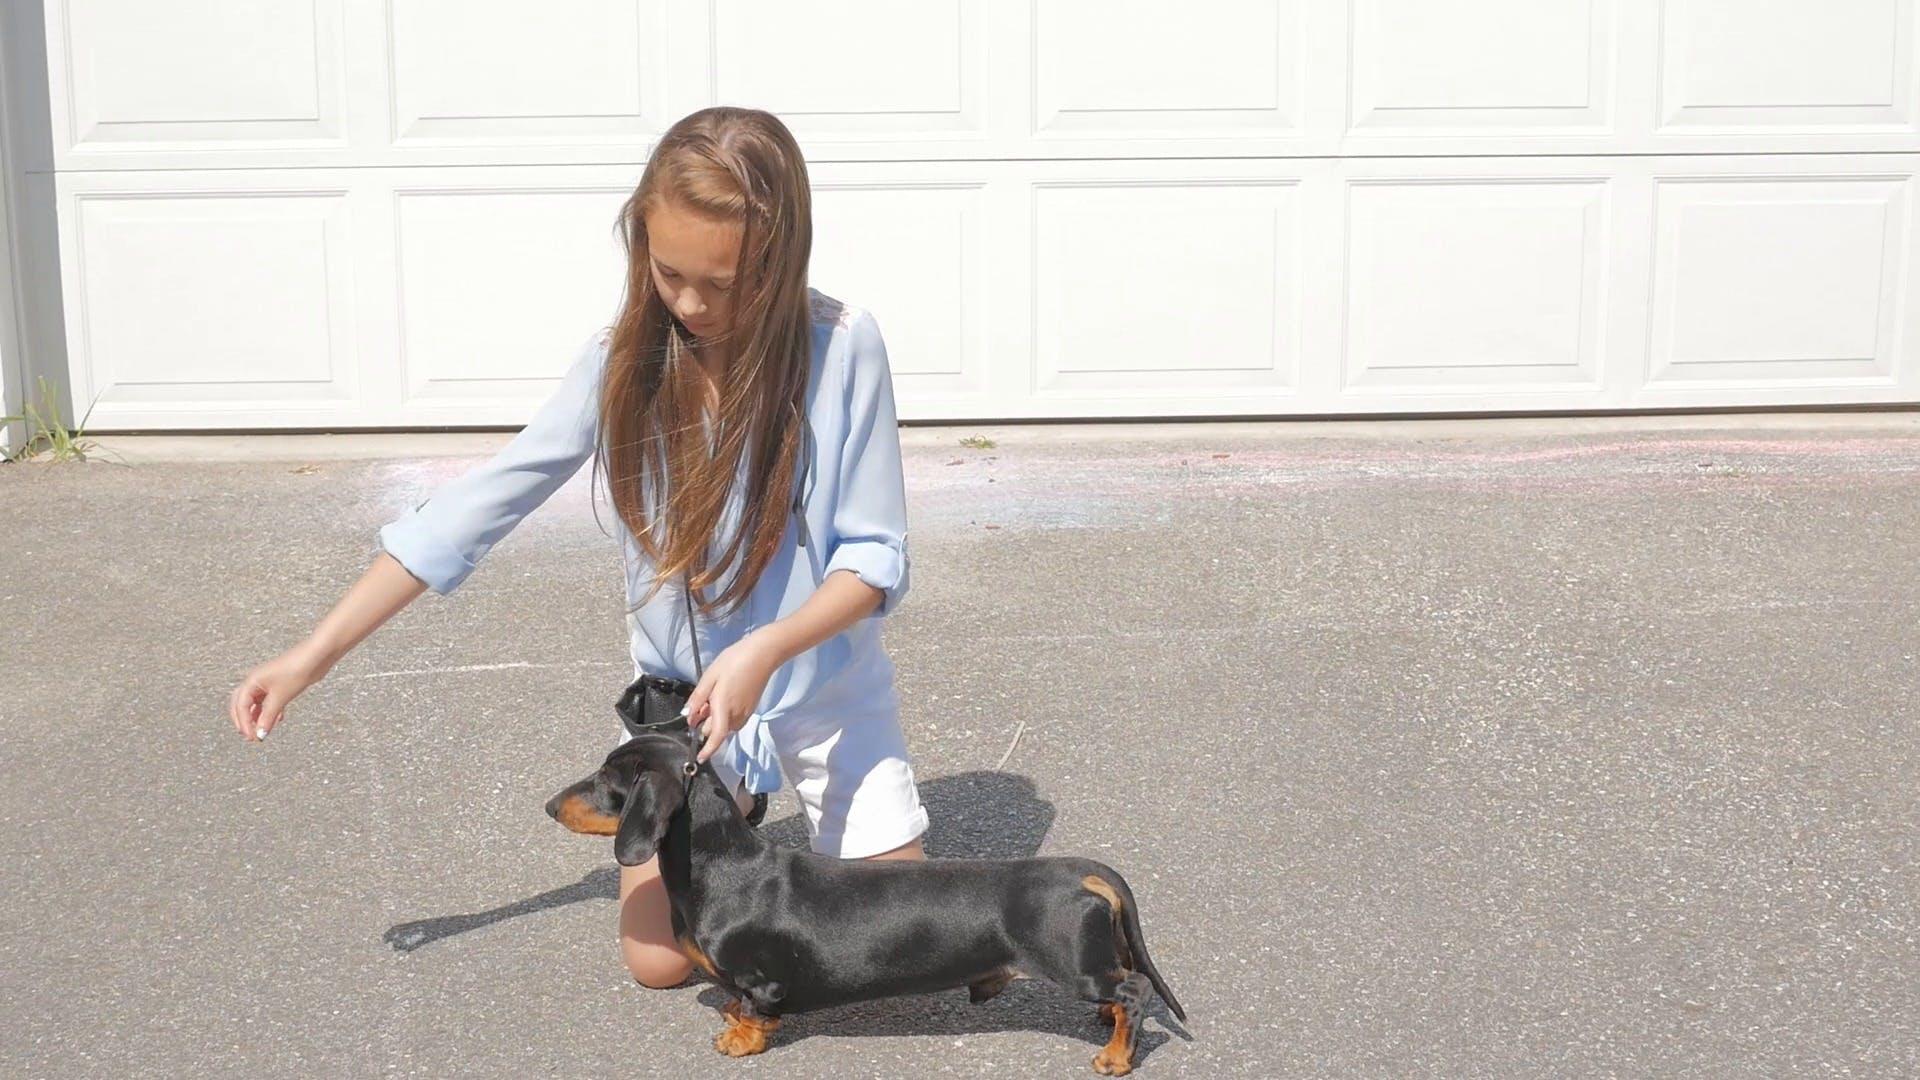 AKC.TV Presents - A Family Sport - Lily Rider | AKC.TV